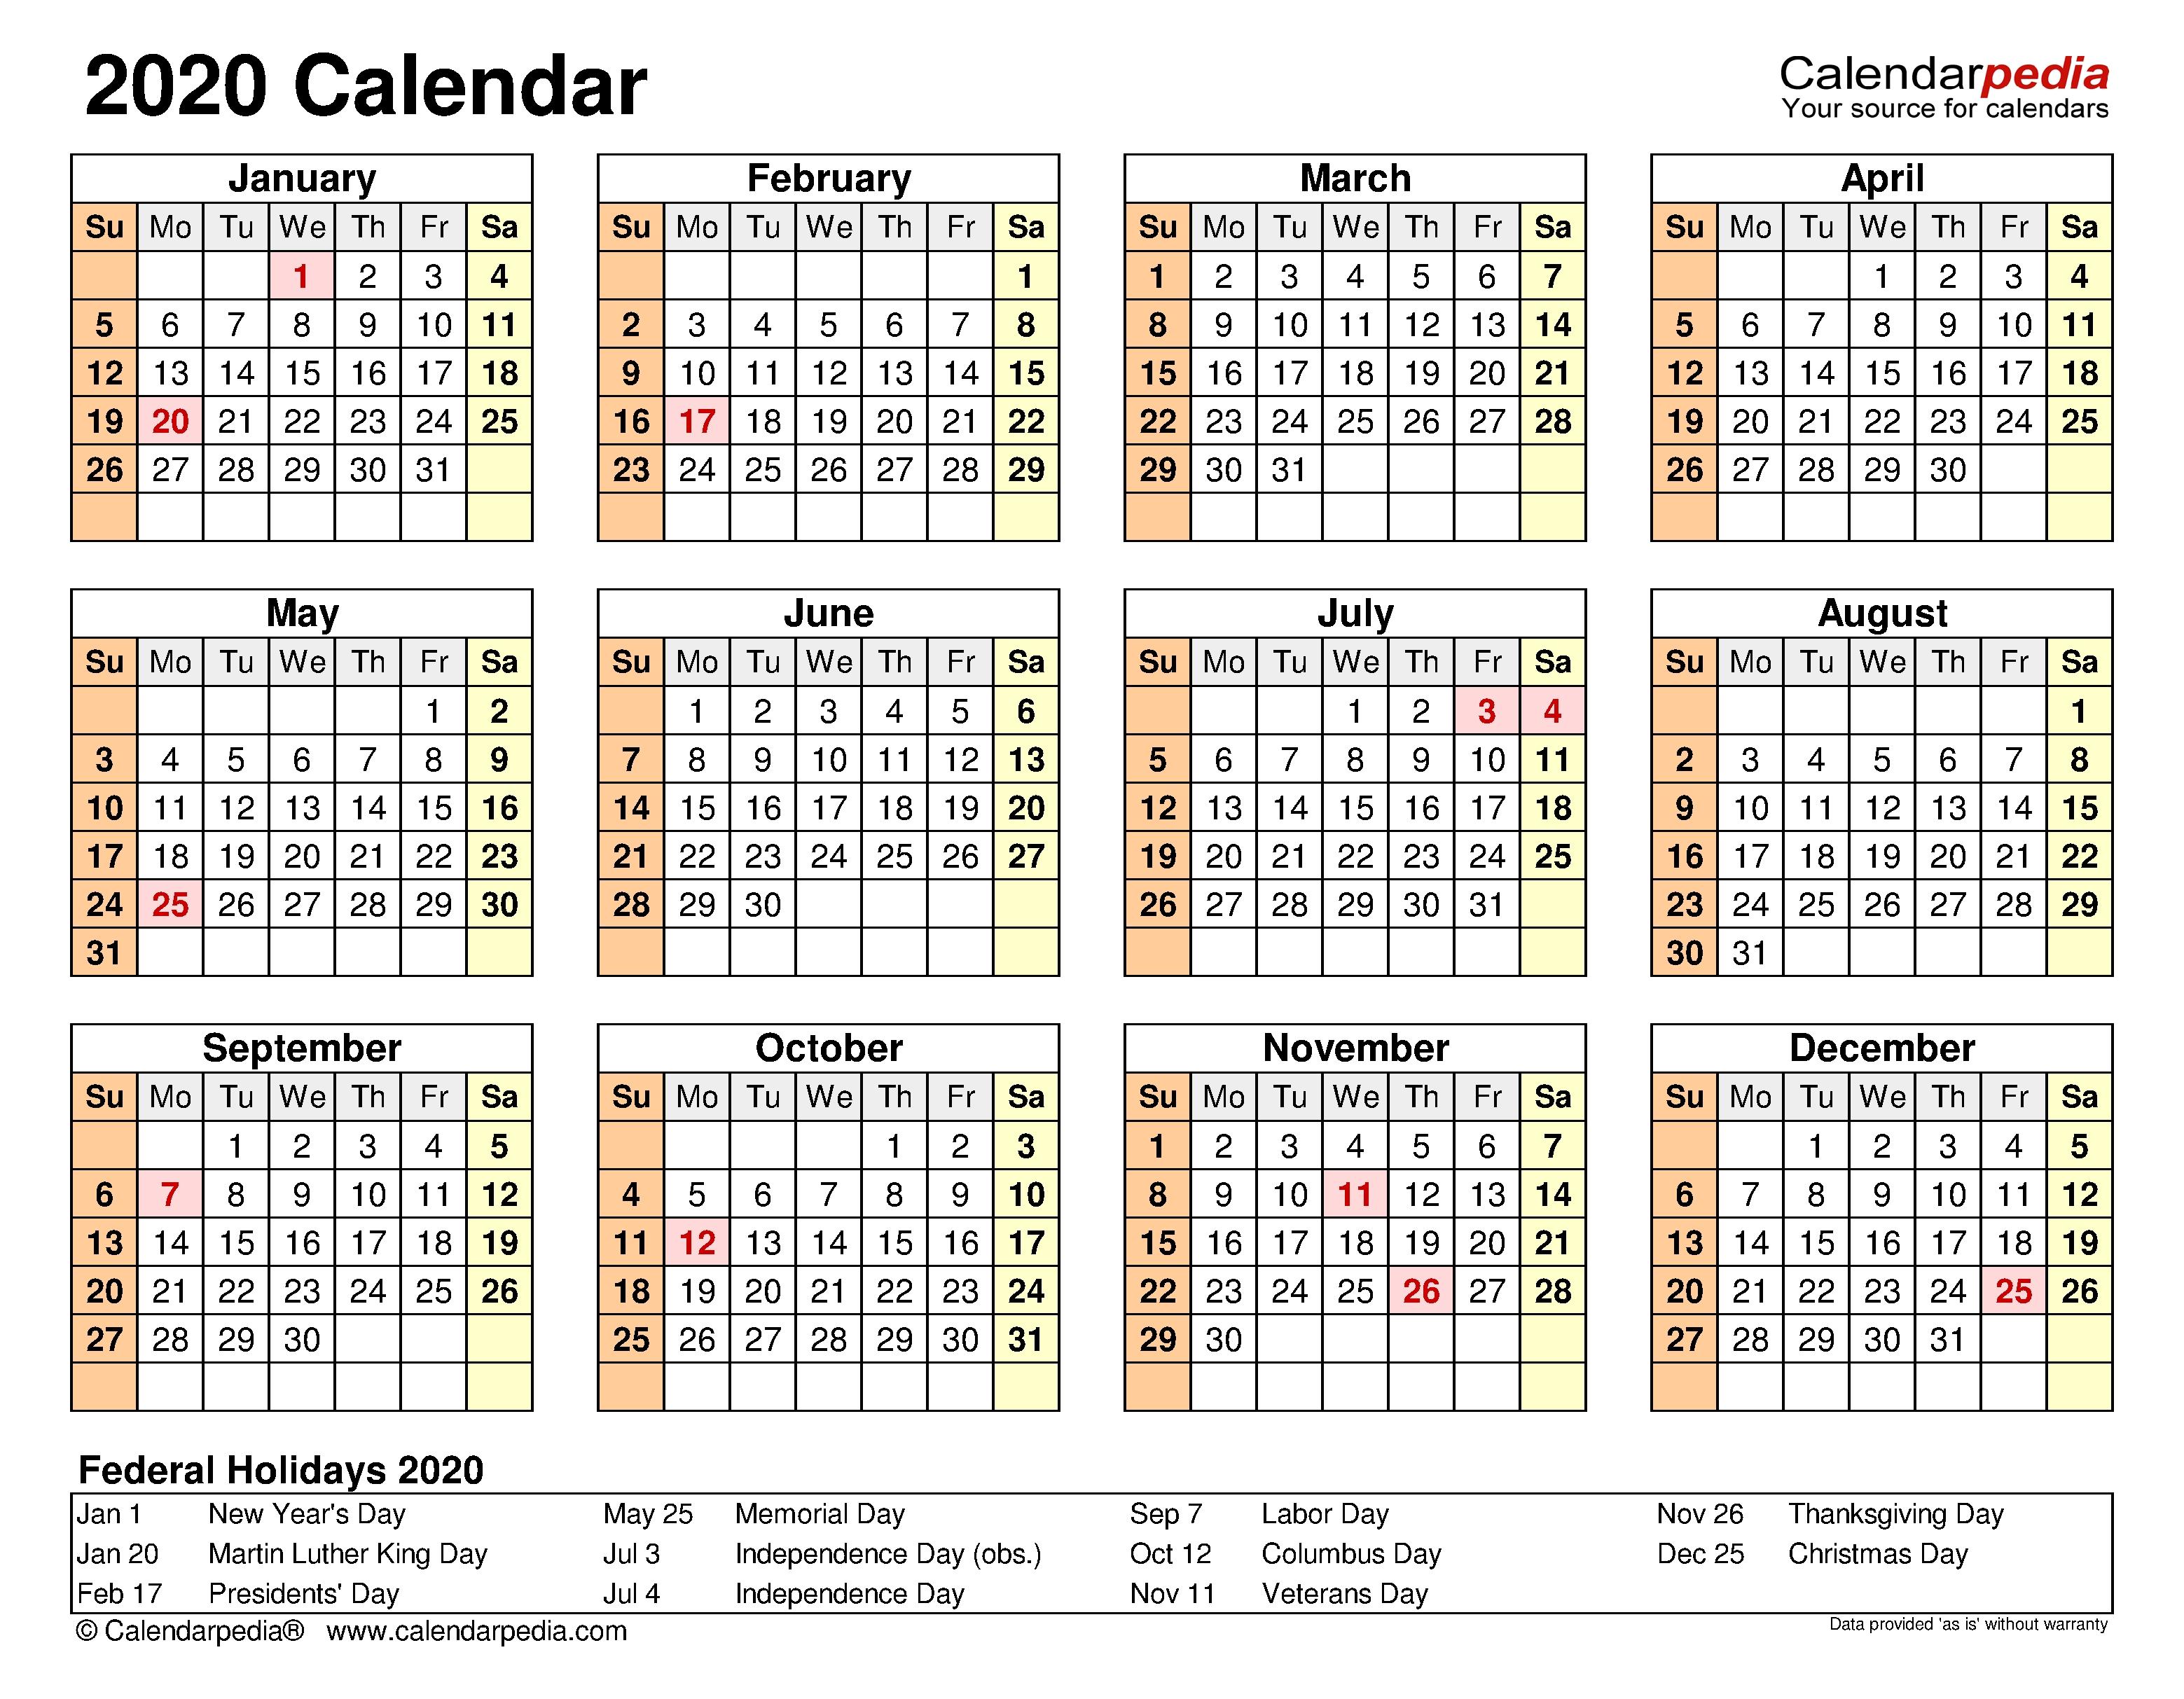 2020 Calendar - Free Printable Microsoft Word Templates  Financial Ytd Calender 2021 Australia